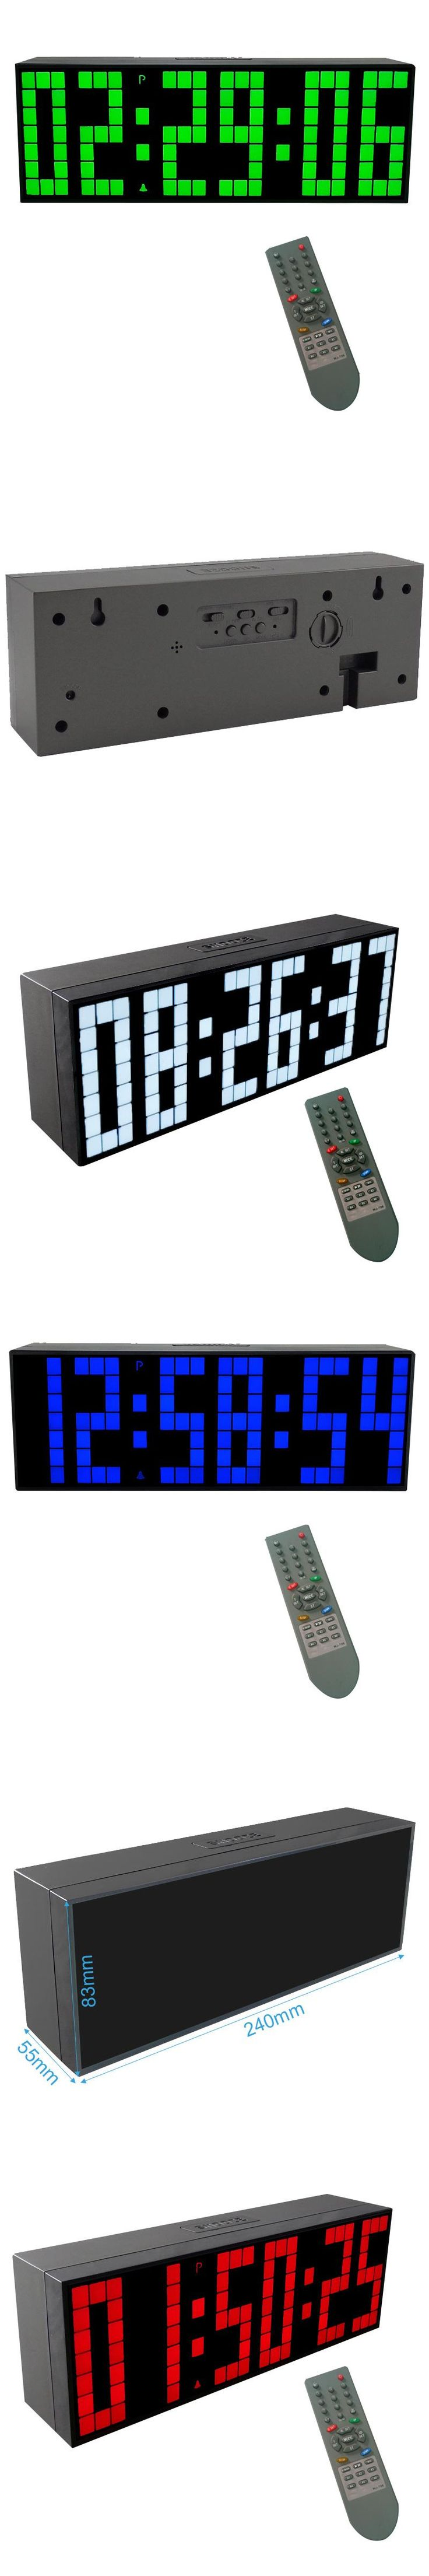 CH KOSDA Remote Control Large Digital LED Alarm Clock Countdown Timer Big Screen Sports Stopwatch Snooze Temperature Home Decor